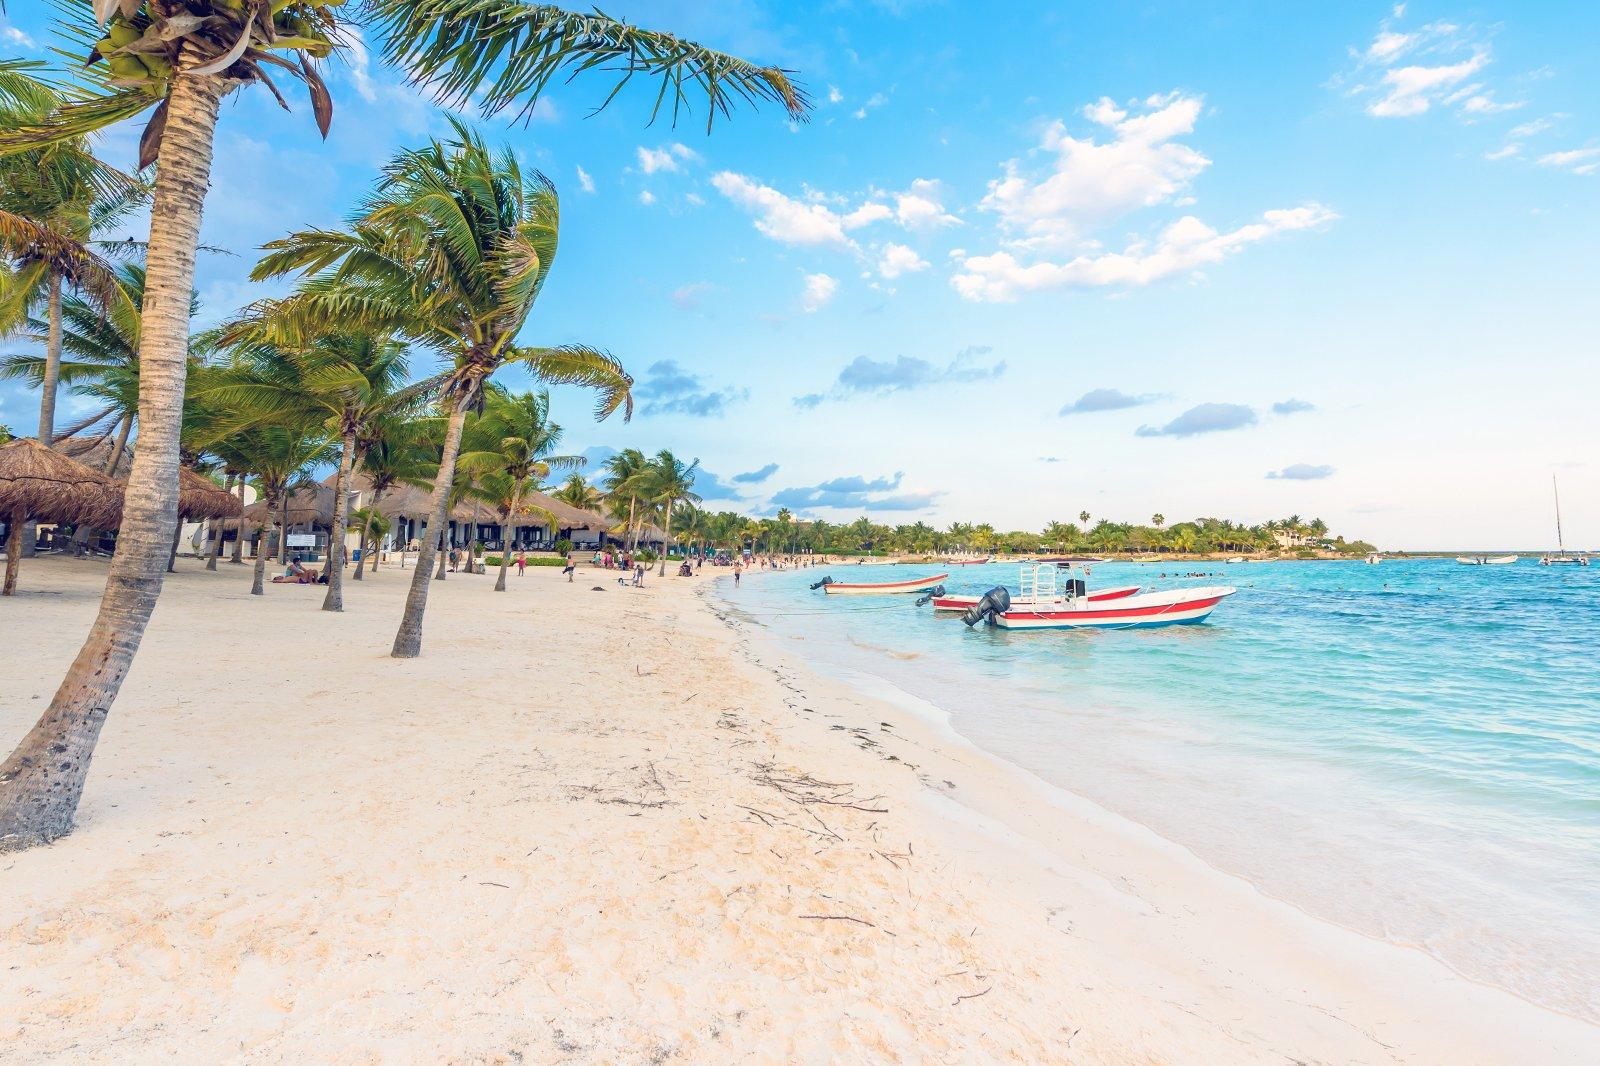 8 Best Beaches In Tulum Where To